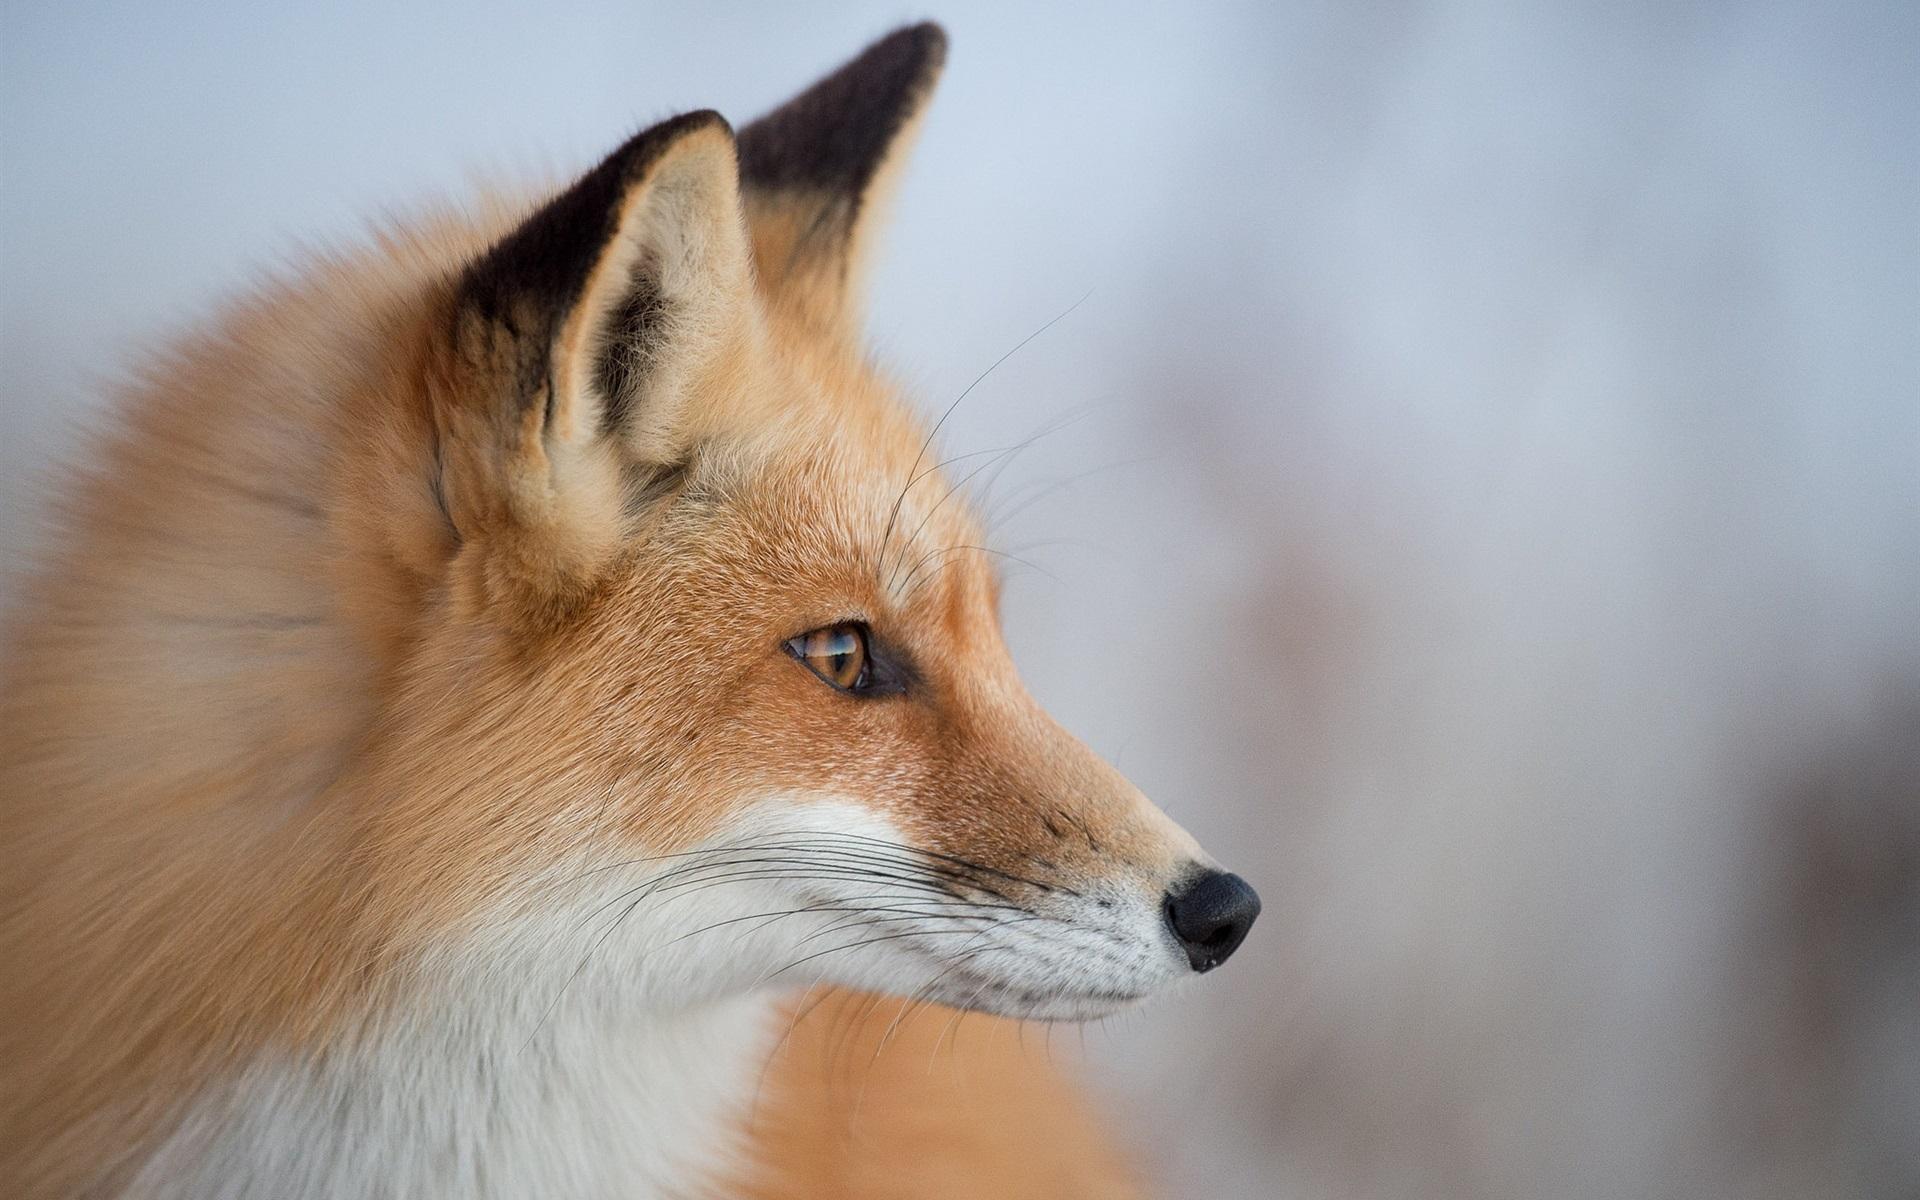 Wallpaper Animal Close Up Fox Head Face Bokeh 1920x1200 Hd Picture Image